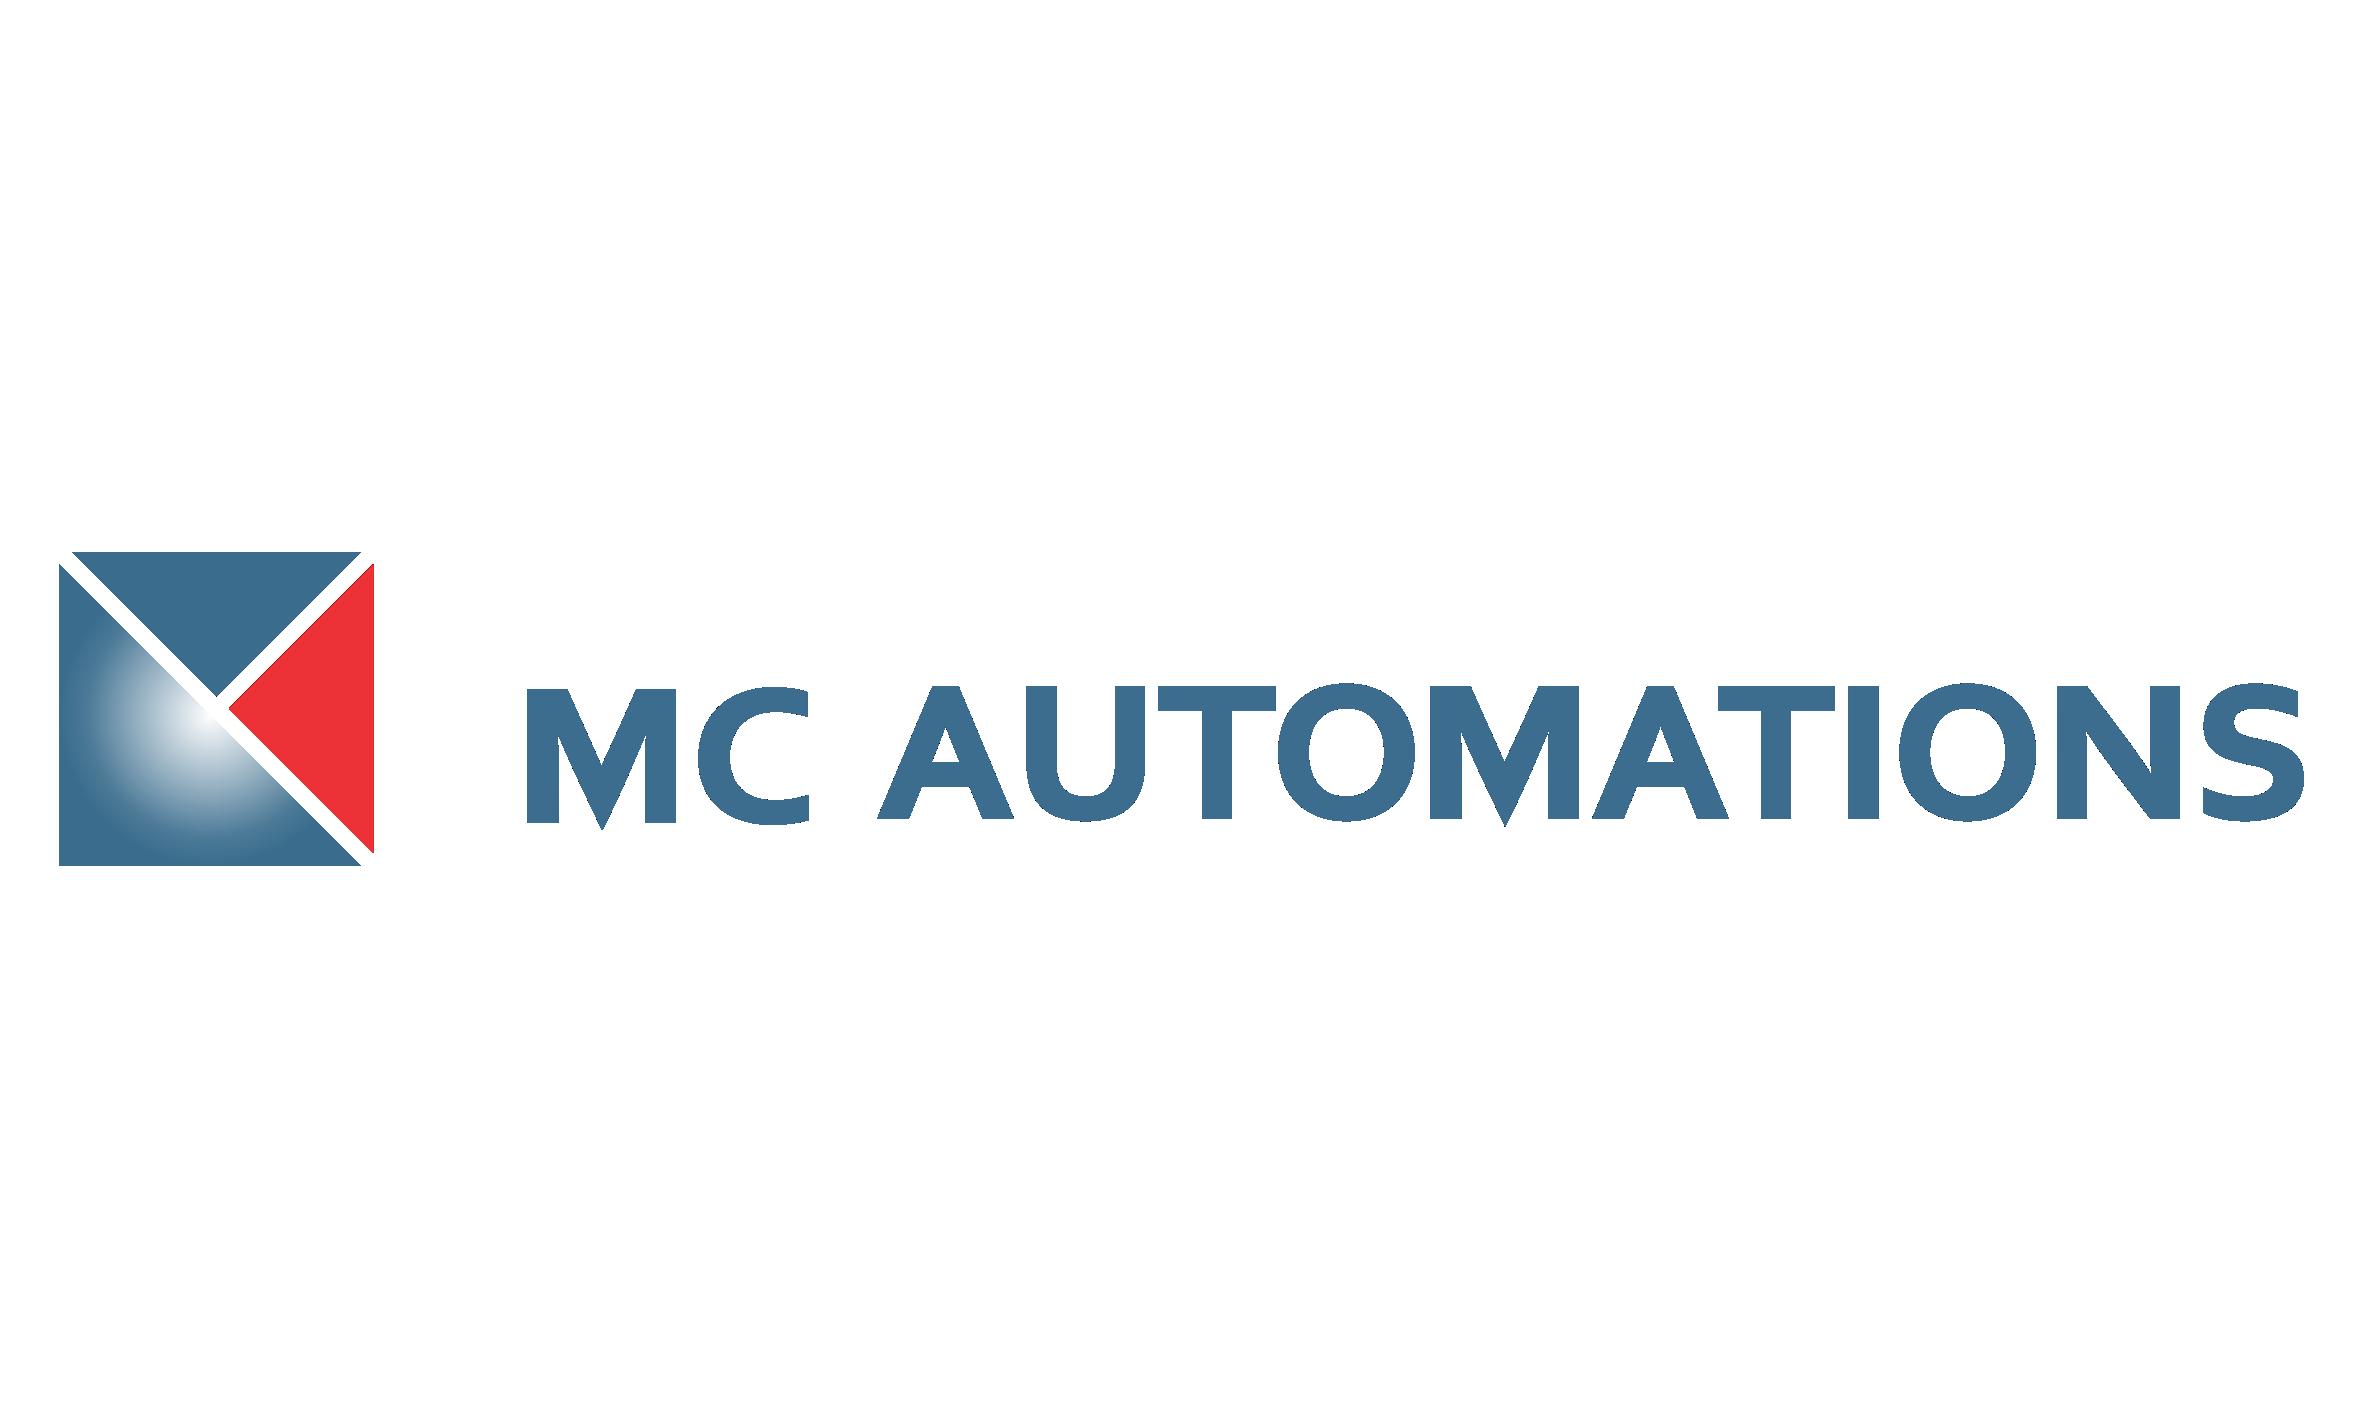 15 MC AUTOMATION